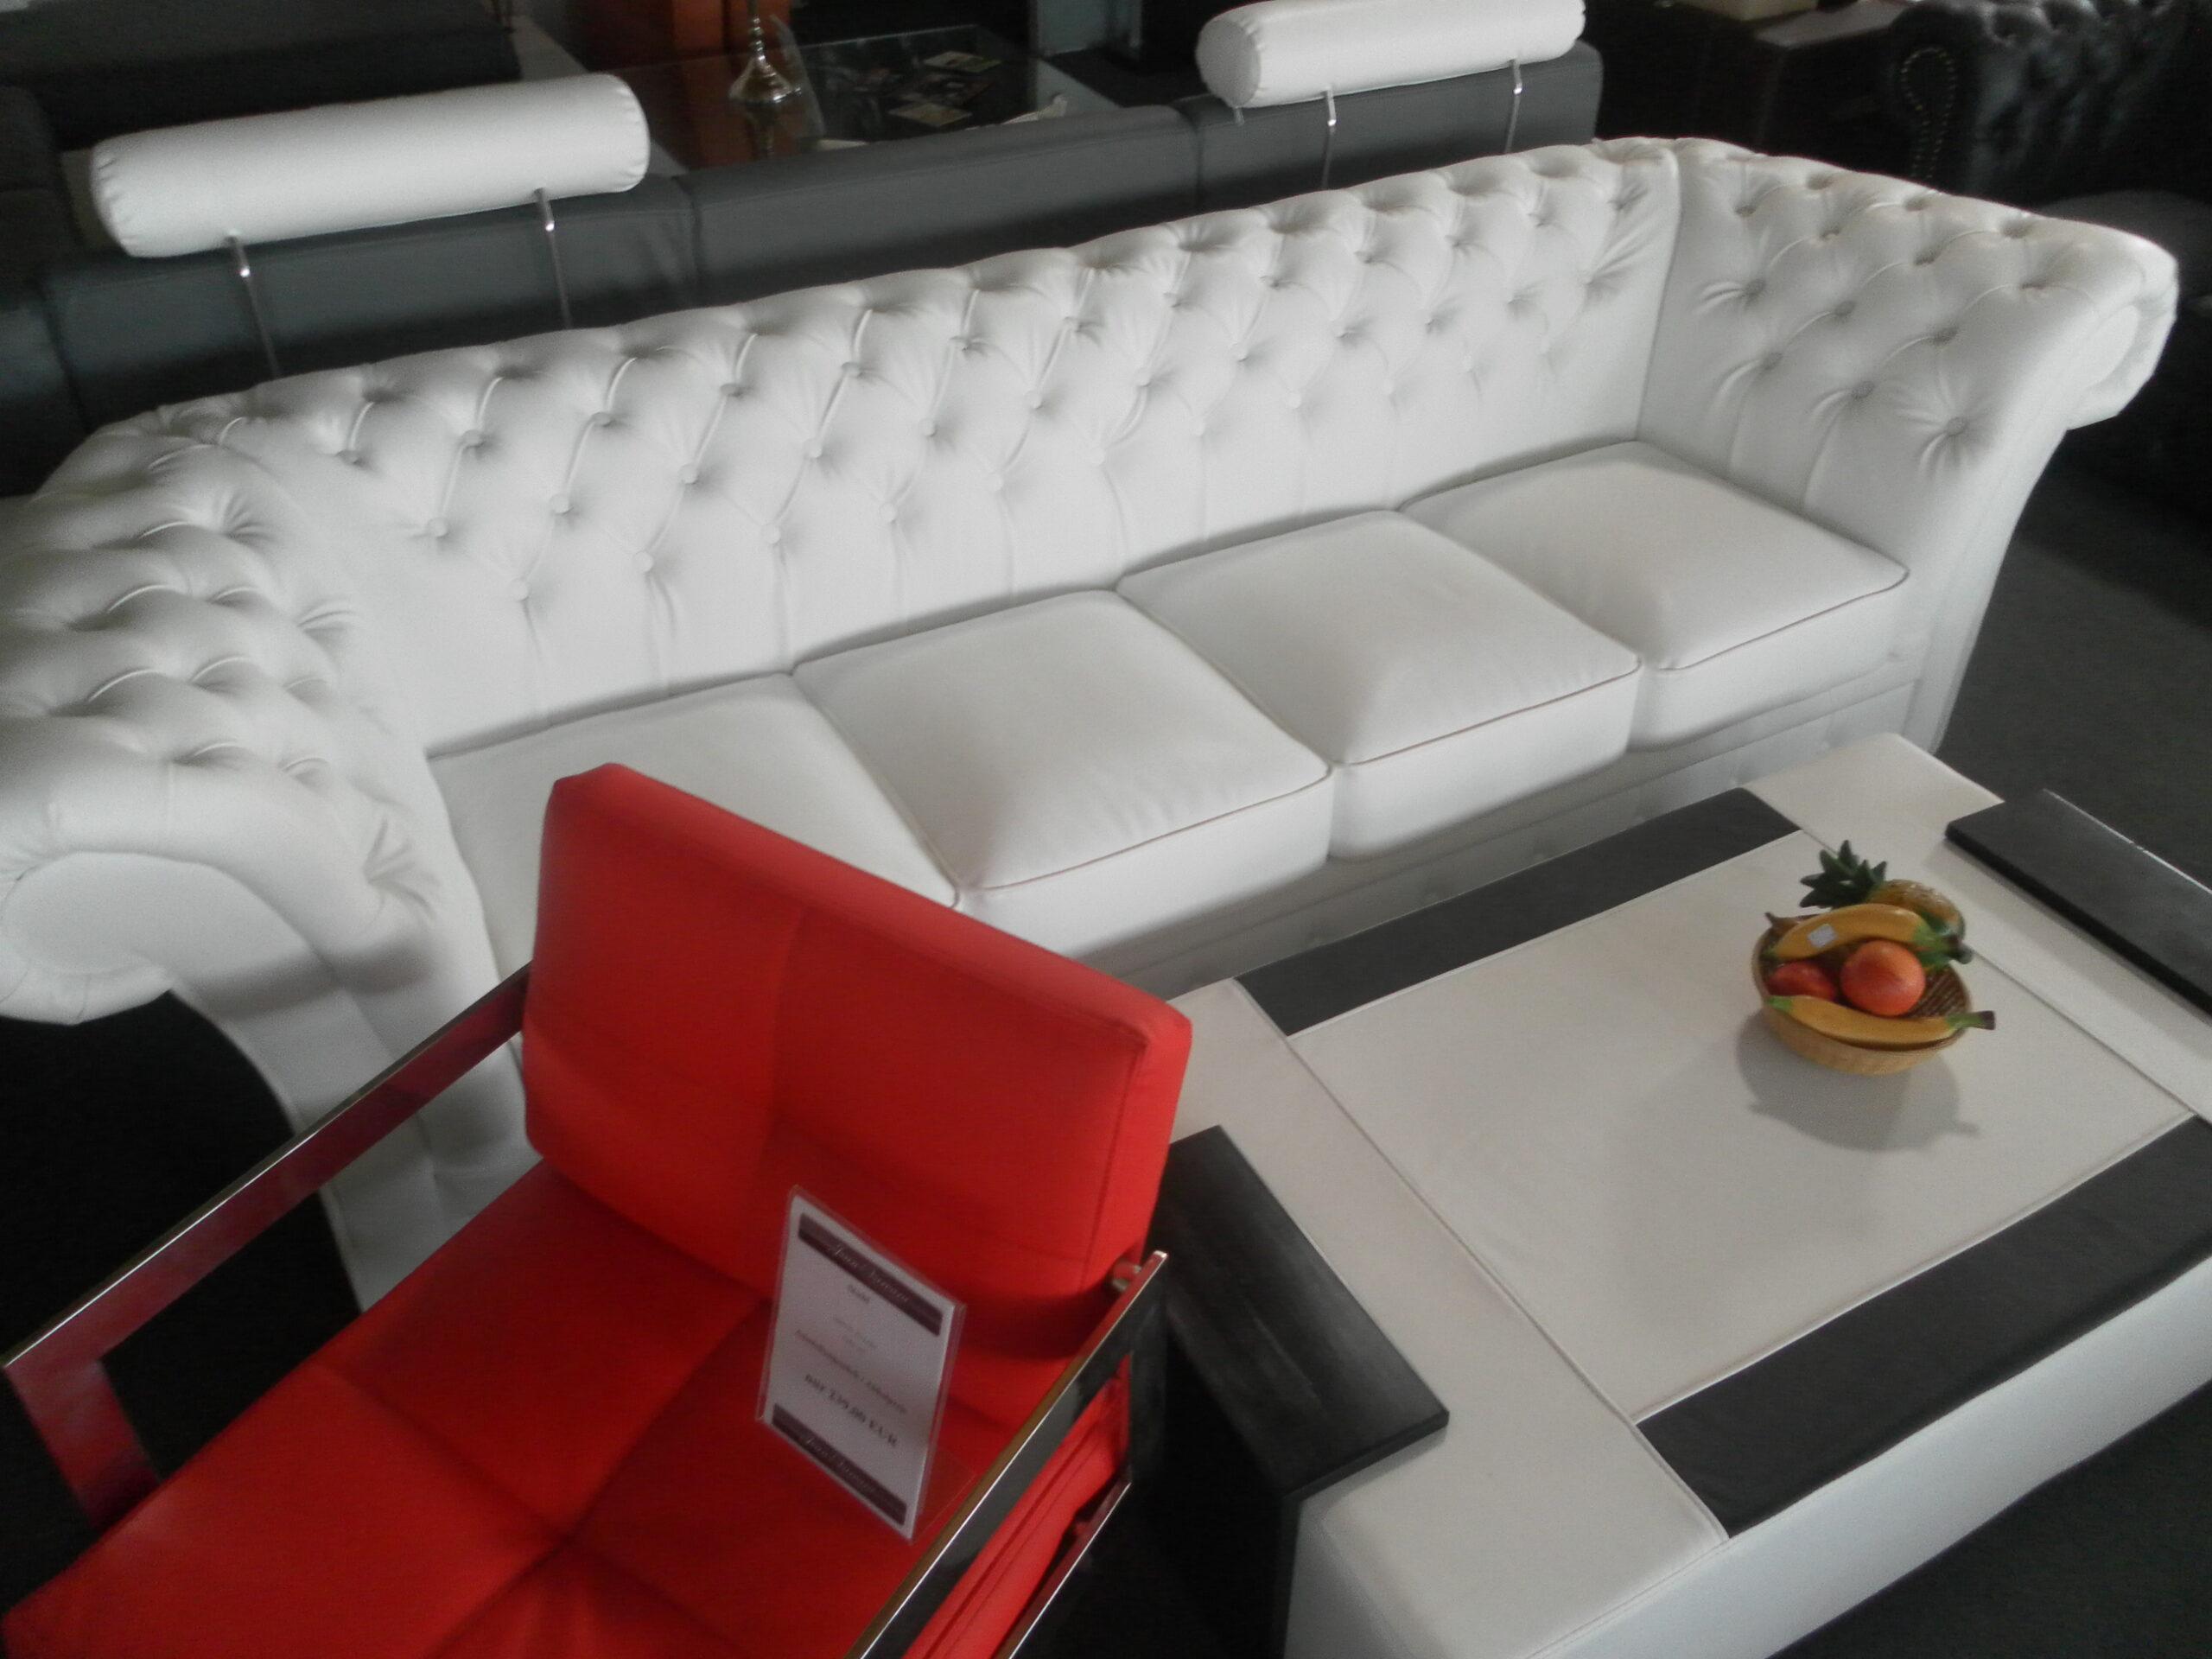 Full Size of Designer Chesterfield 270 Cm Big Sofa Couch Leder 5 Sitzer Bezug Boxspring Federkern Günstiges Leinen Kunstleder Weiß Lila Walter Knoll Lagerverkauf Sofa Big Sofa Leder